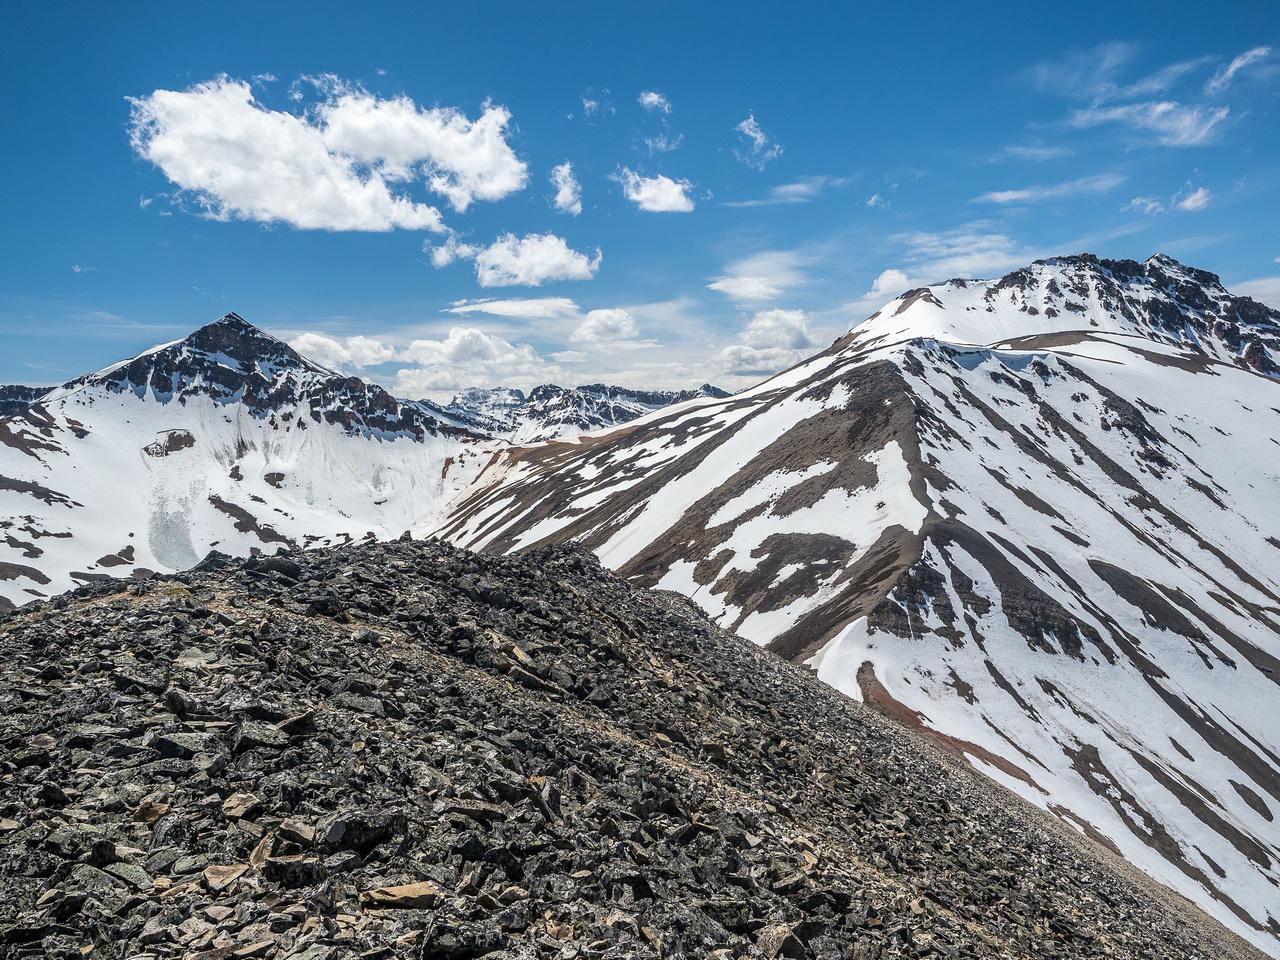 Two O'Clock Peak (L) and Landslide (R), looking pretty darn snowy.